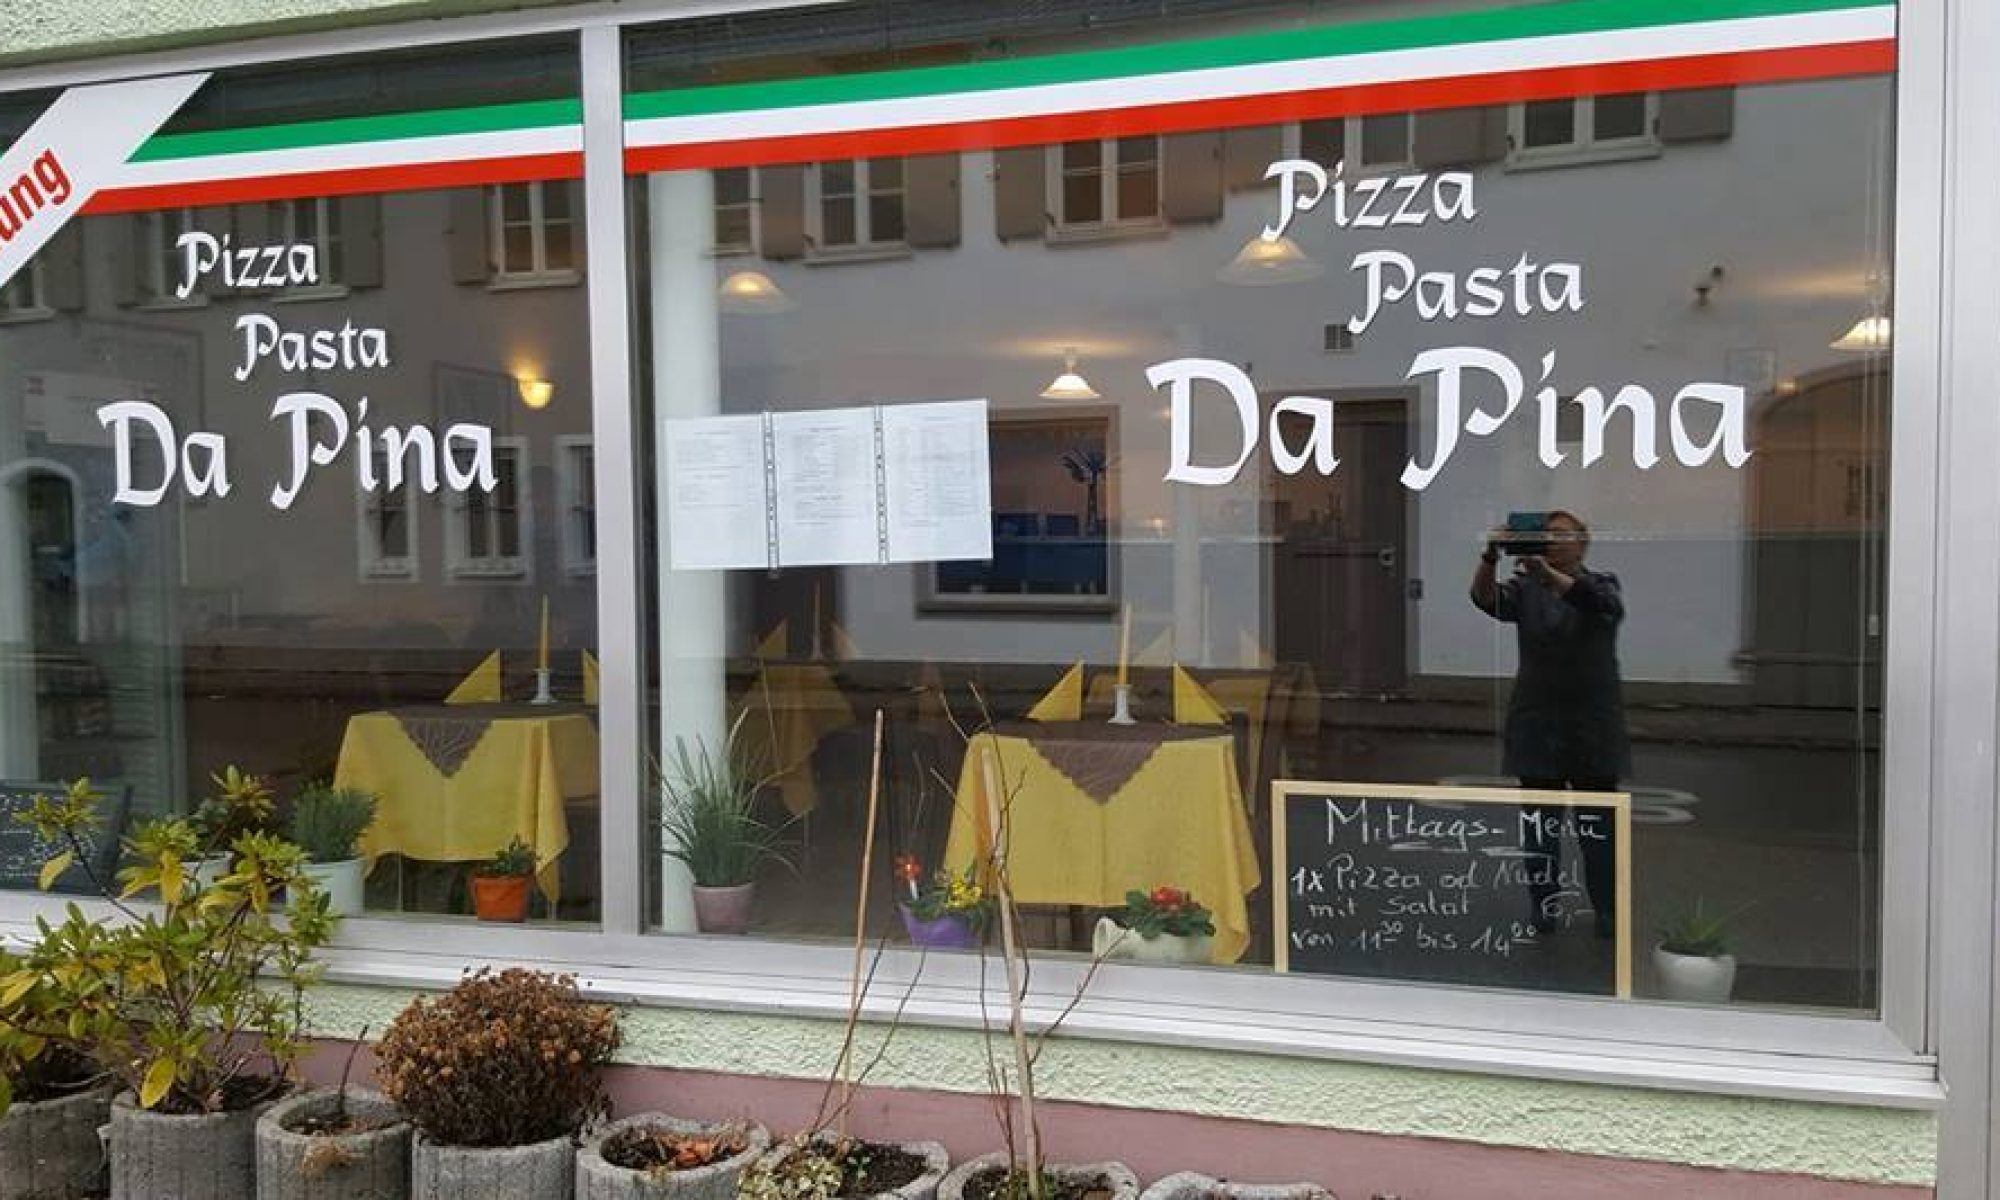 Da Pina - Pizza Pasta Schongau